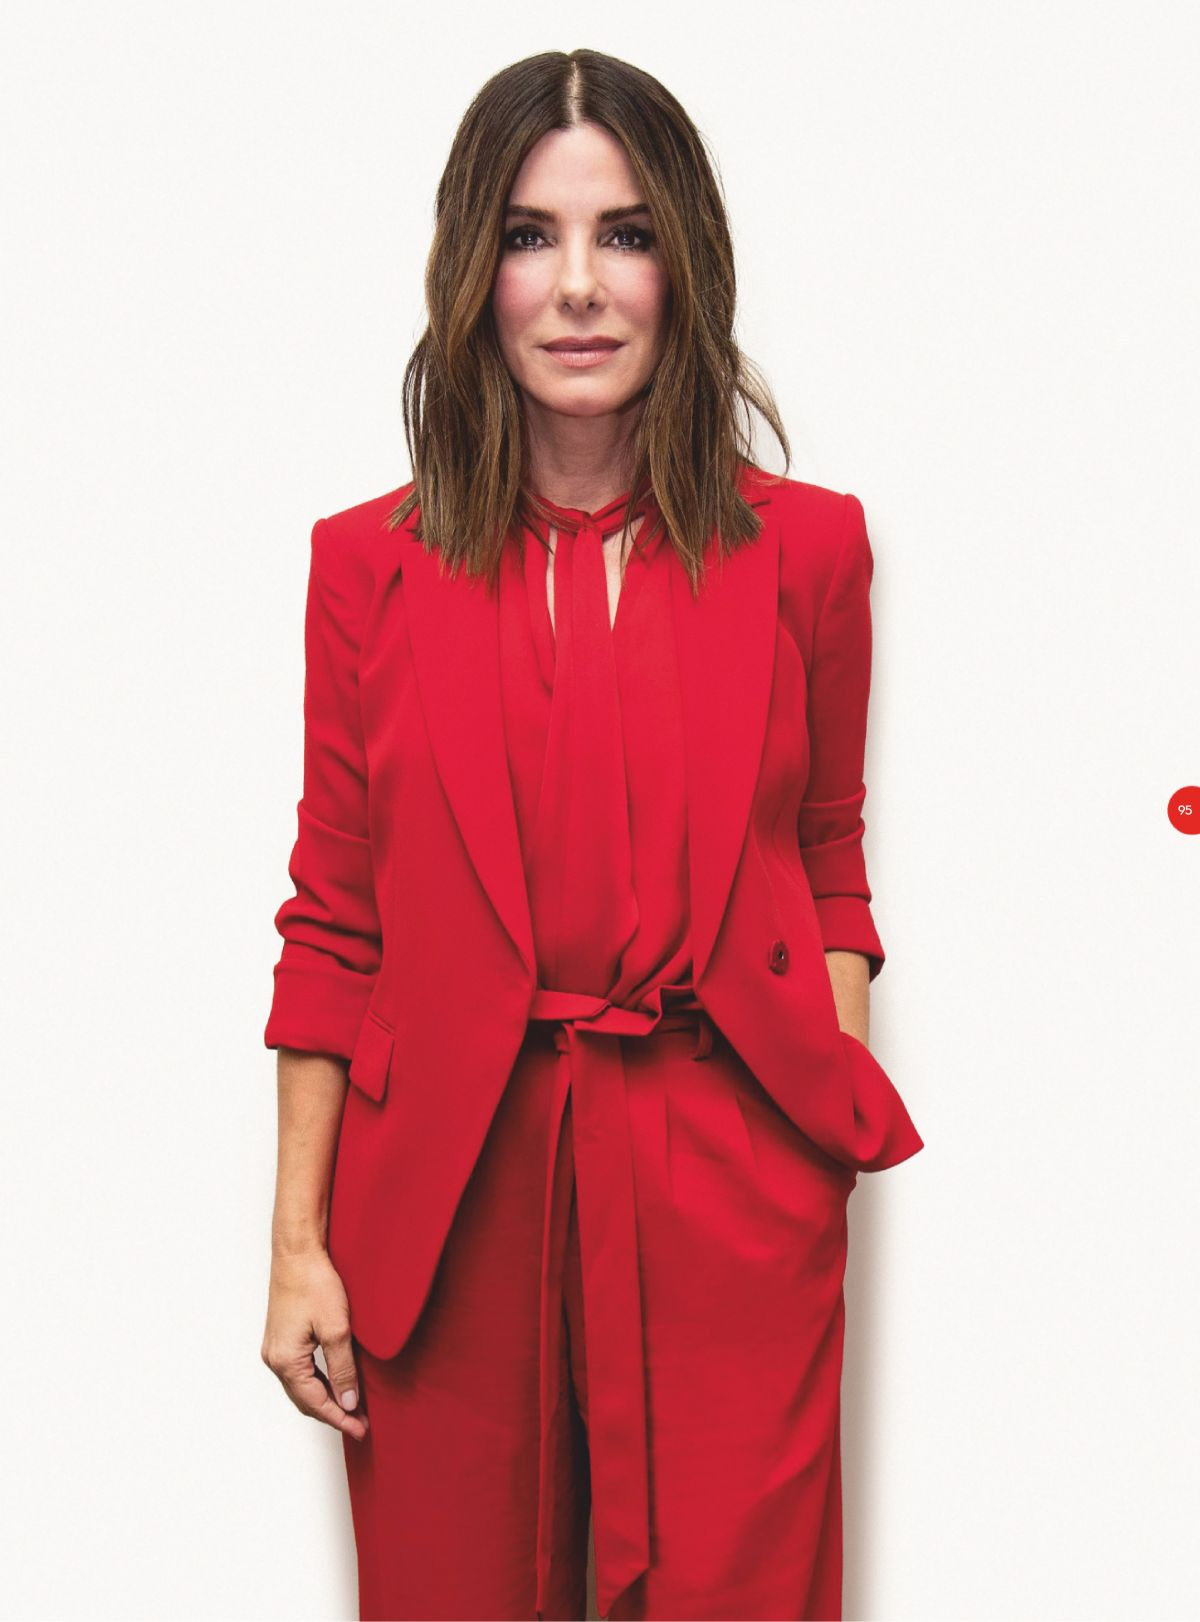 2019 Sandra Bullock nude photos 2019